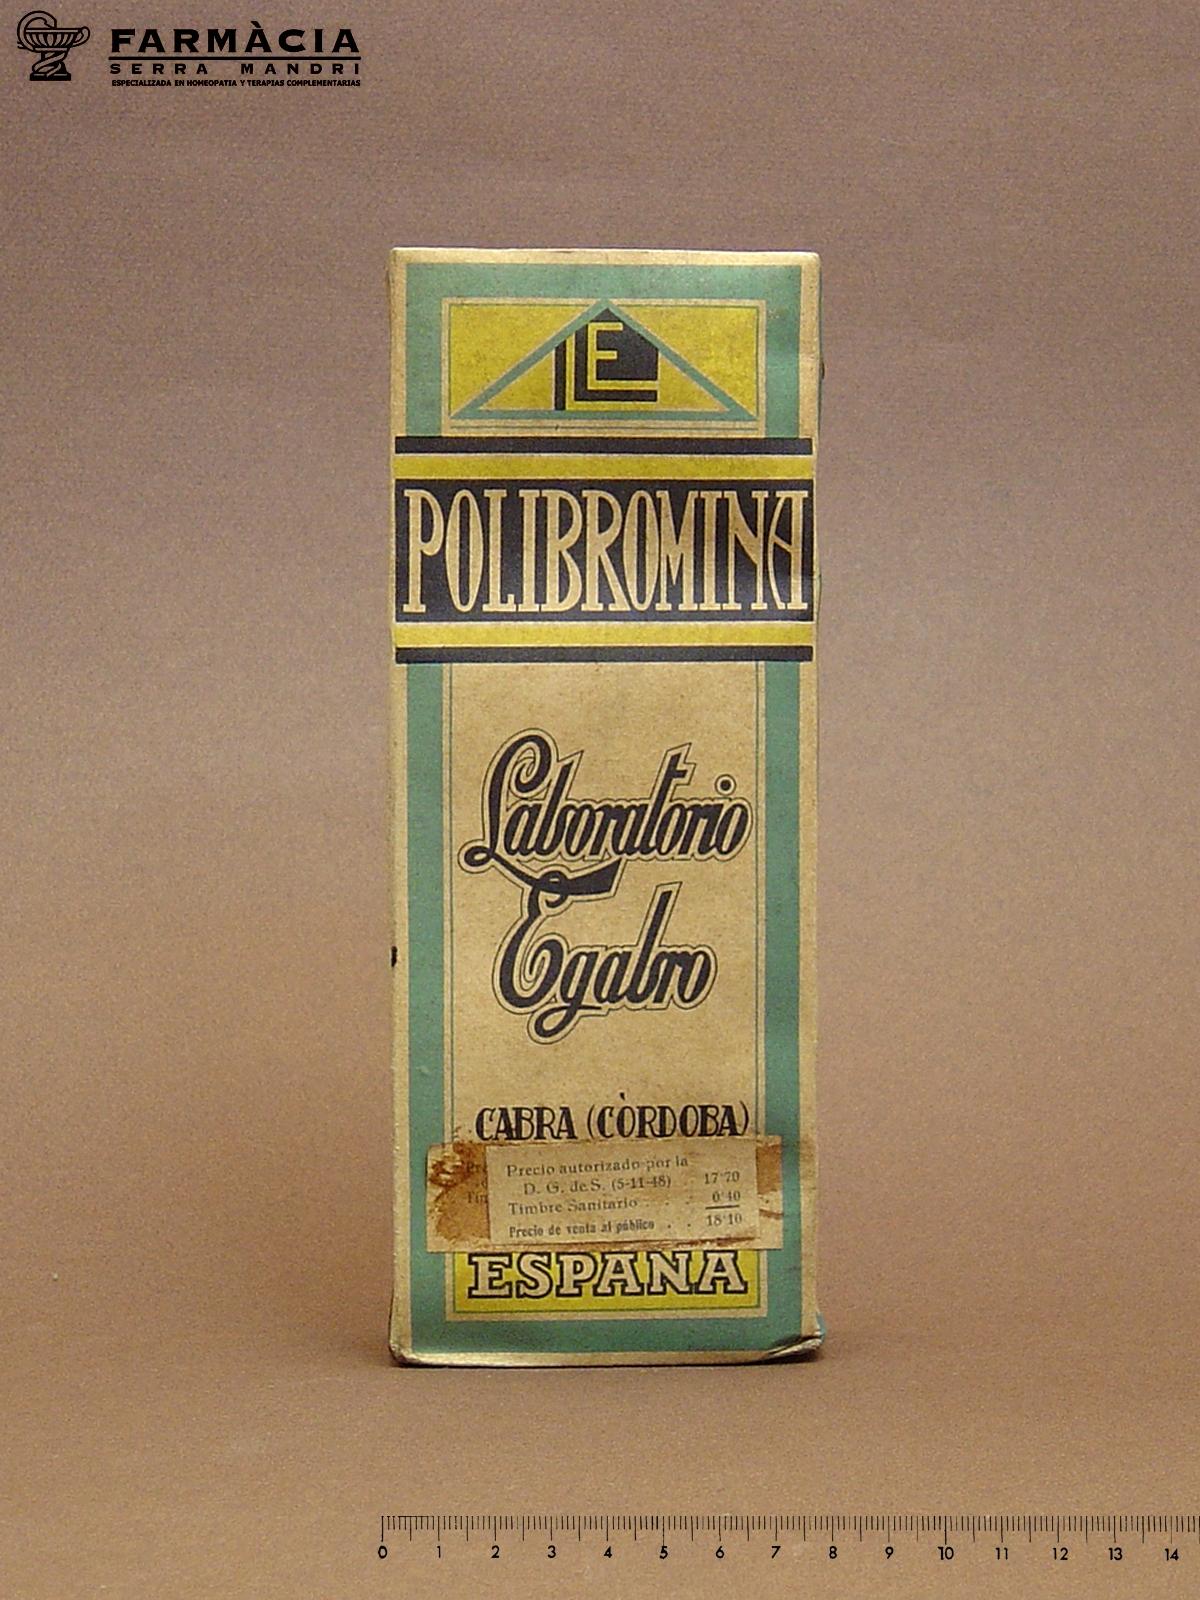 Polibromina